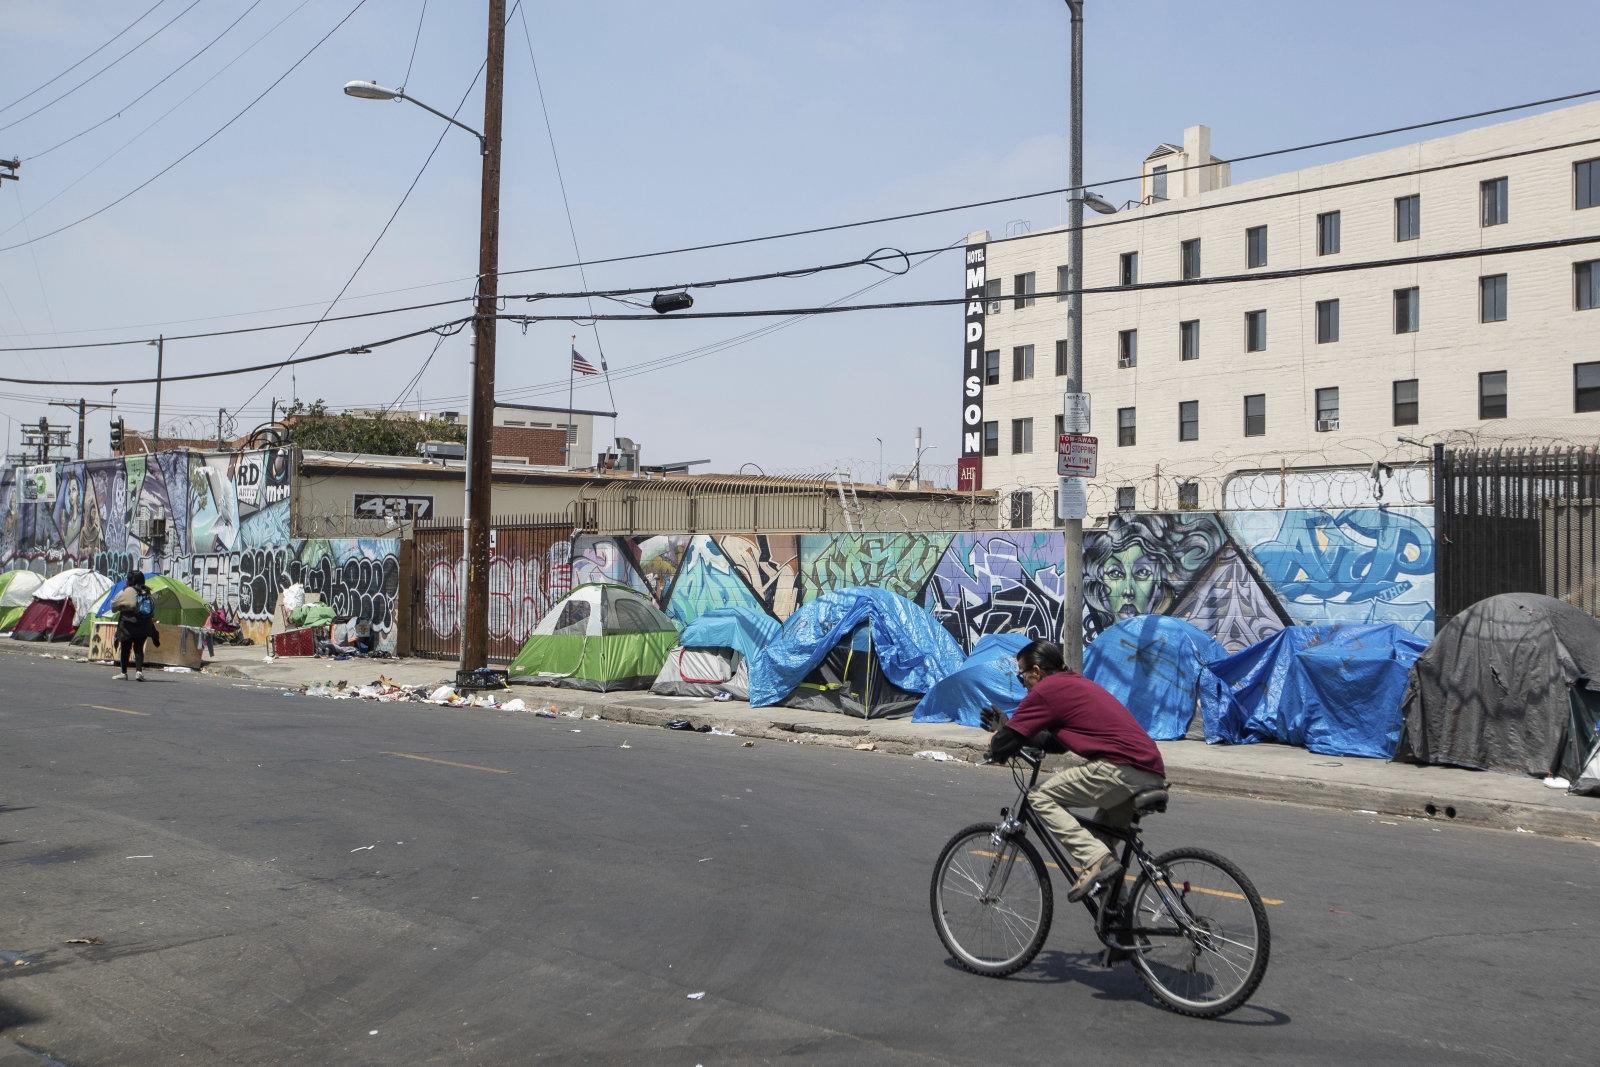 Cruel Google Maps trick marked livestreamer's mansion as a homeless shelter | DeviceDaily.com